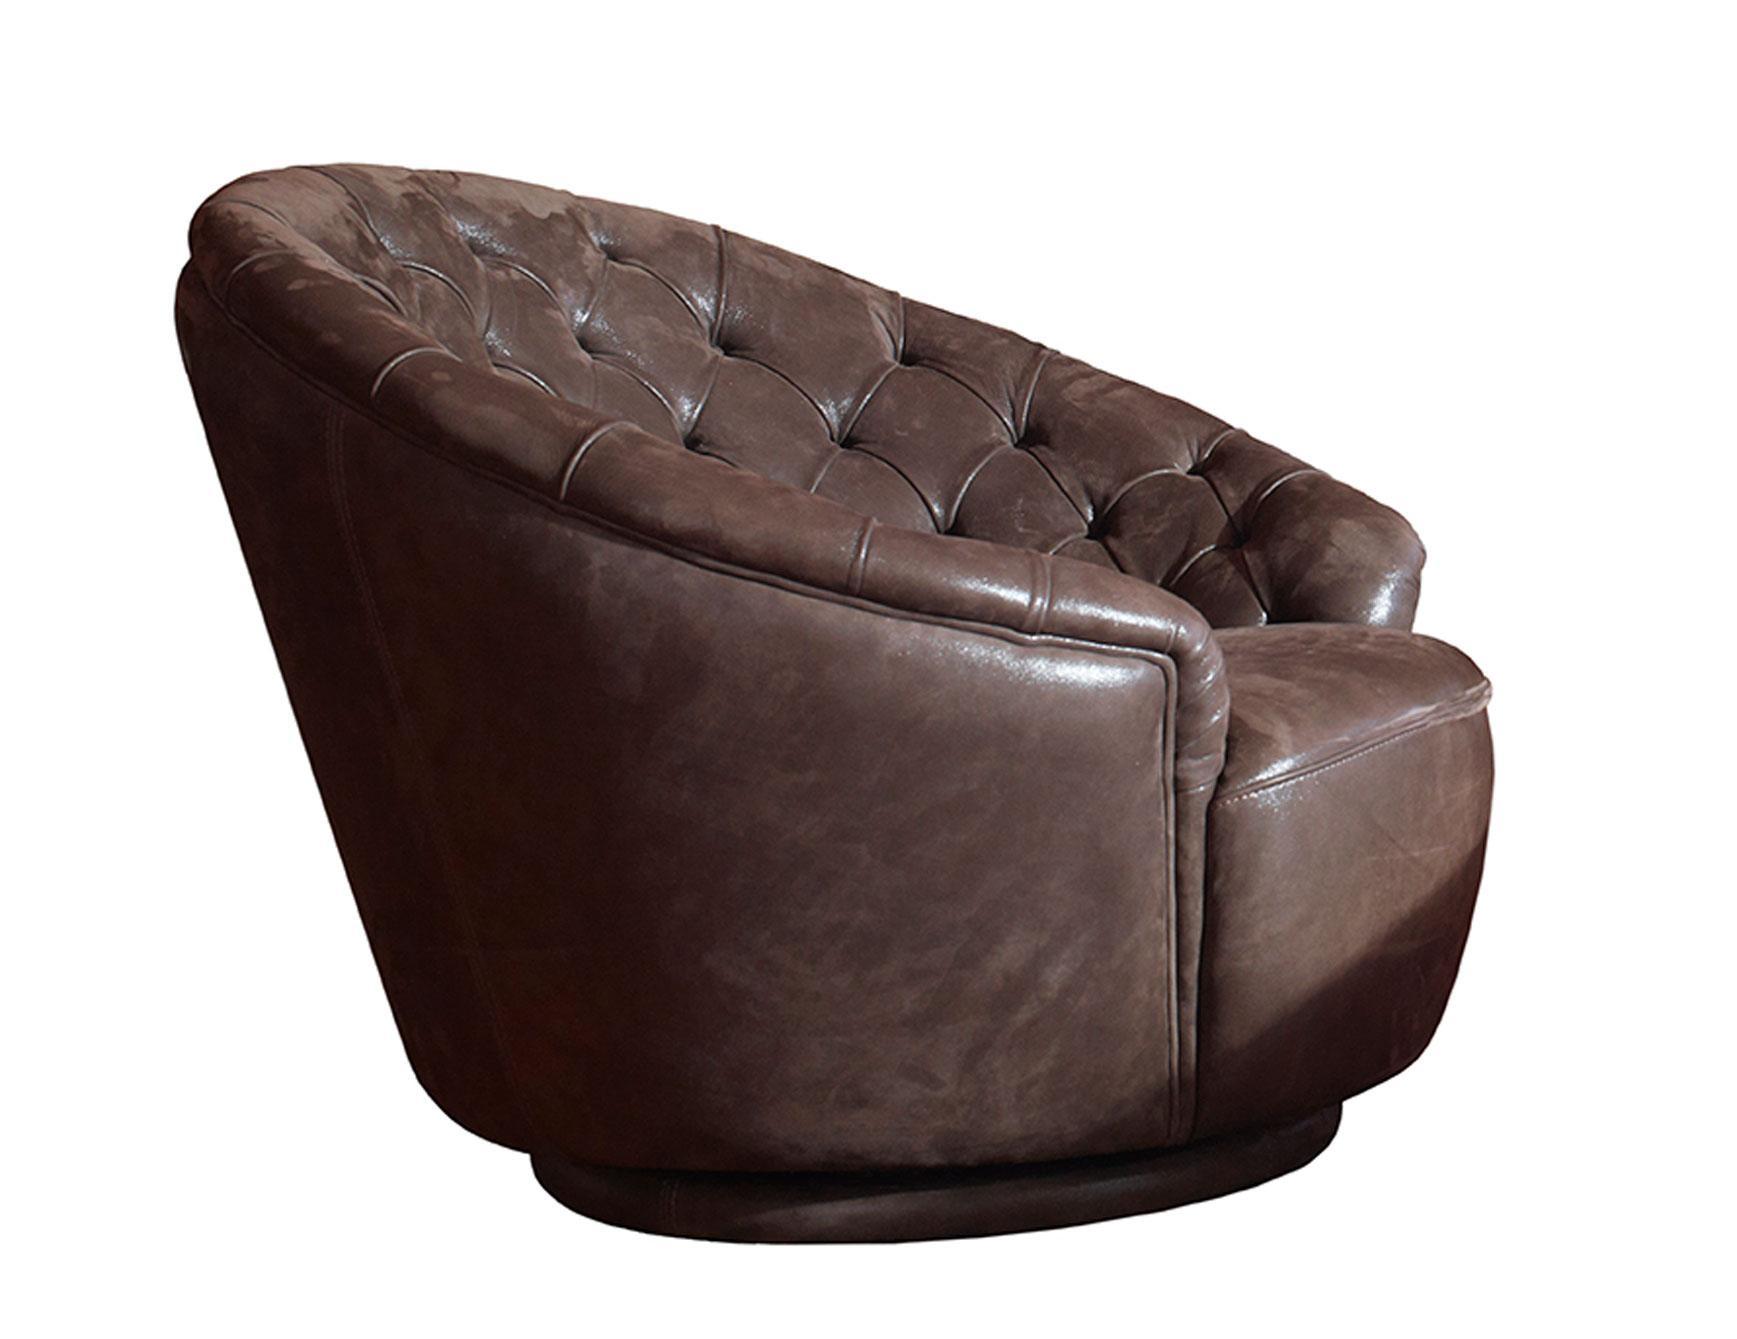 Italian Designer Luxury High End Sofas & Sofa Chairs: Nella Vetrina With High End Sofa (Image 16 of 20)